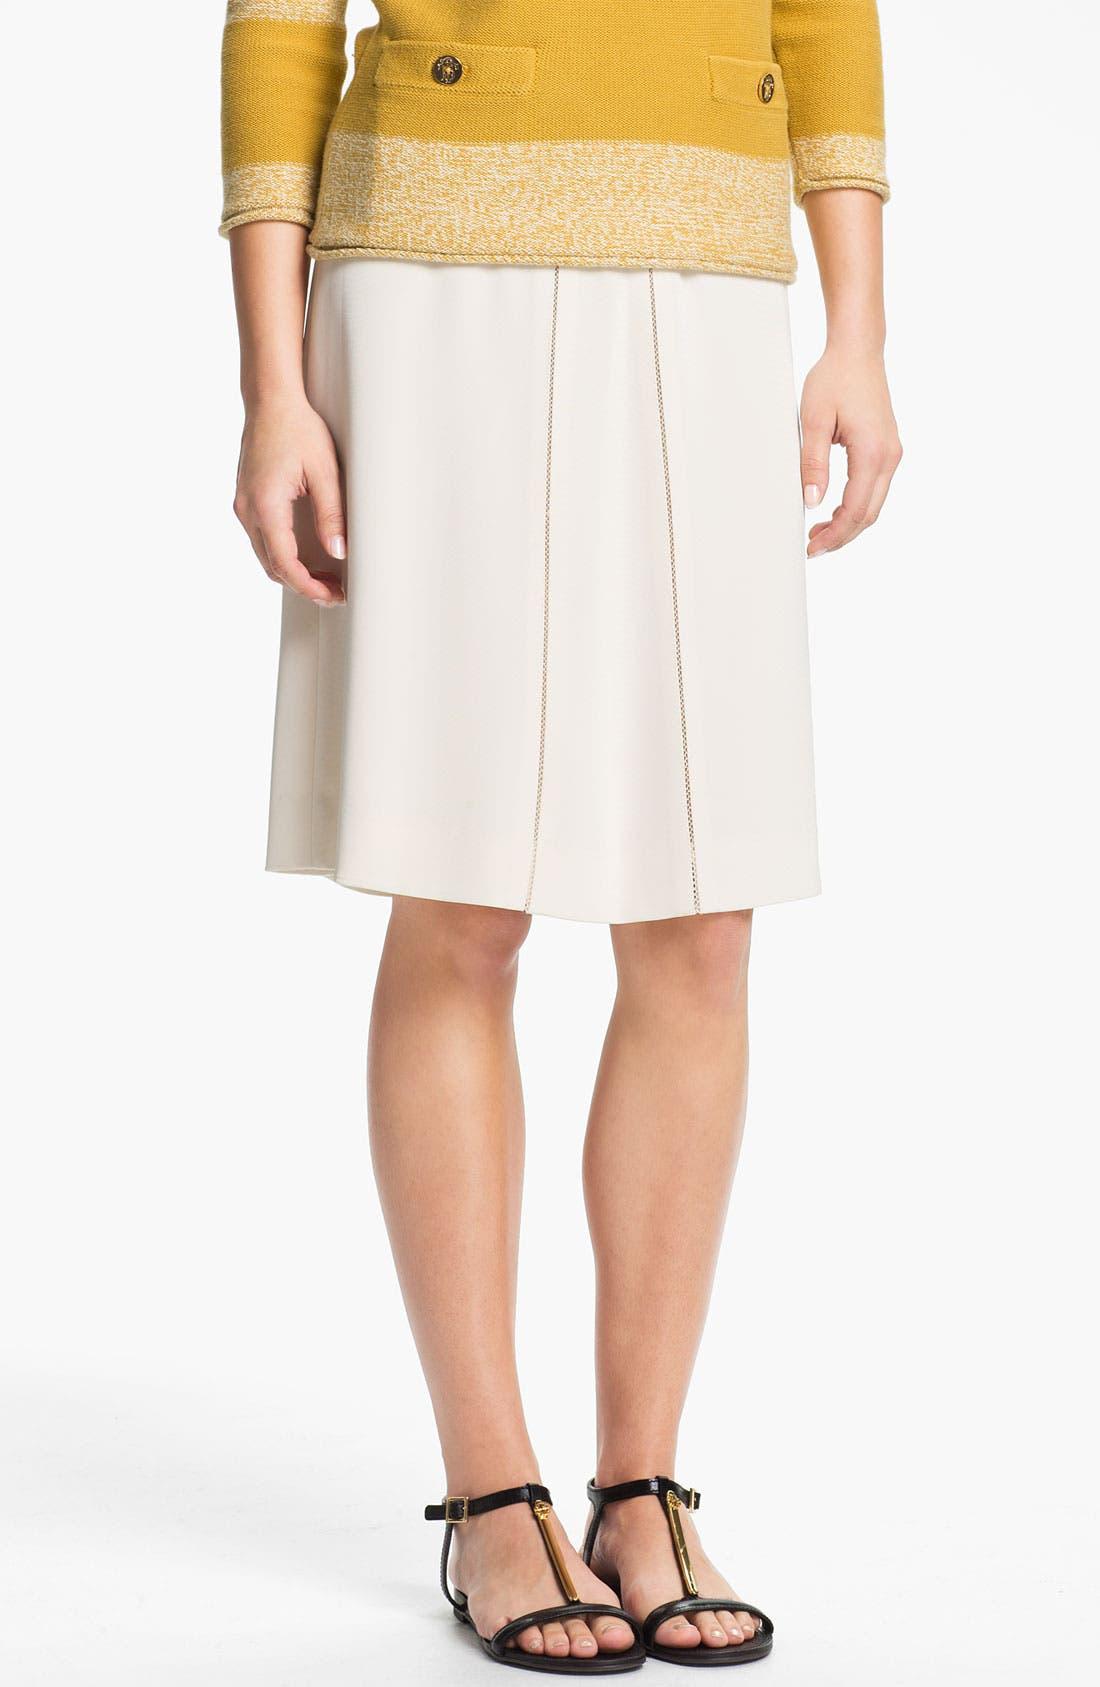 Main Image - Tory Burch 'Alton' Skirt